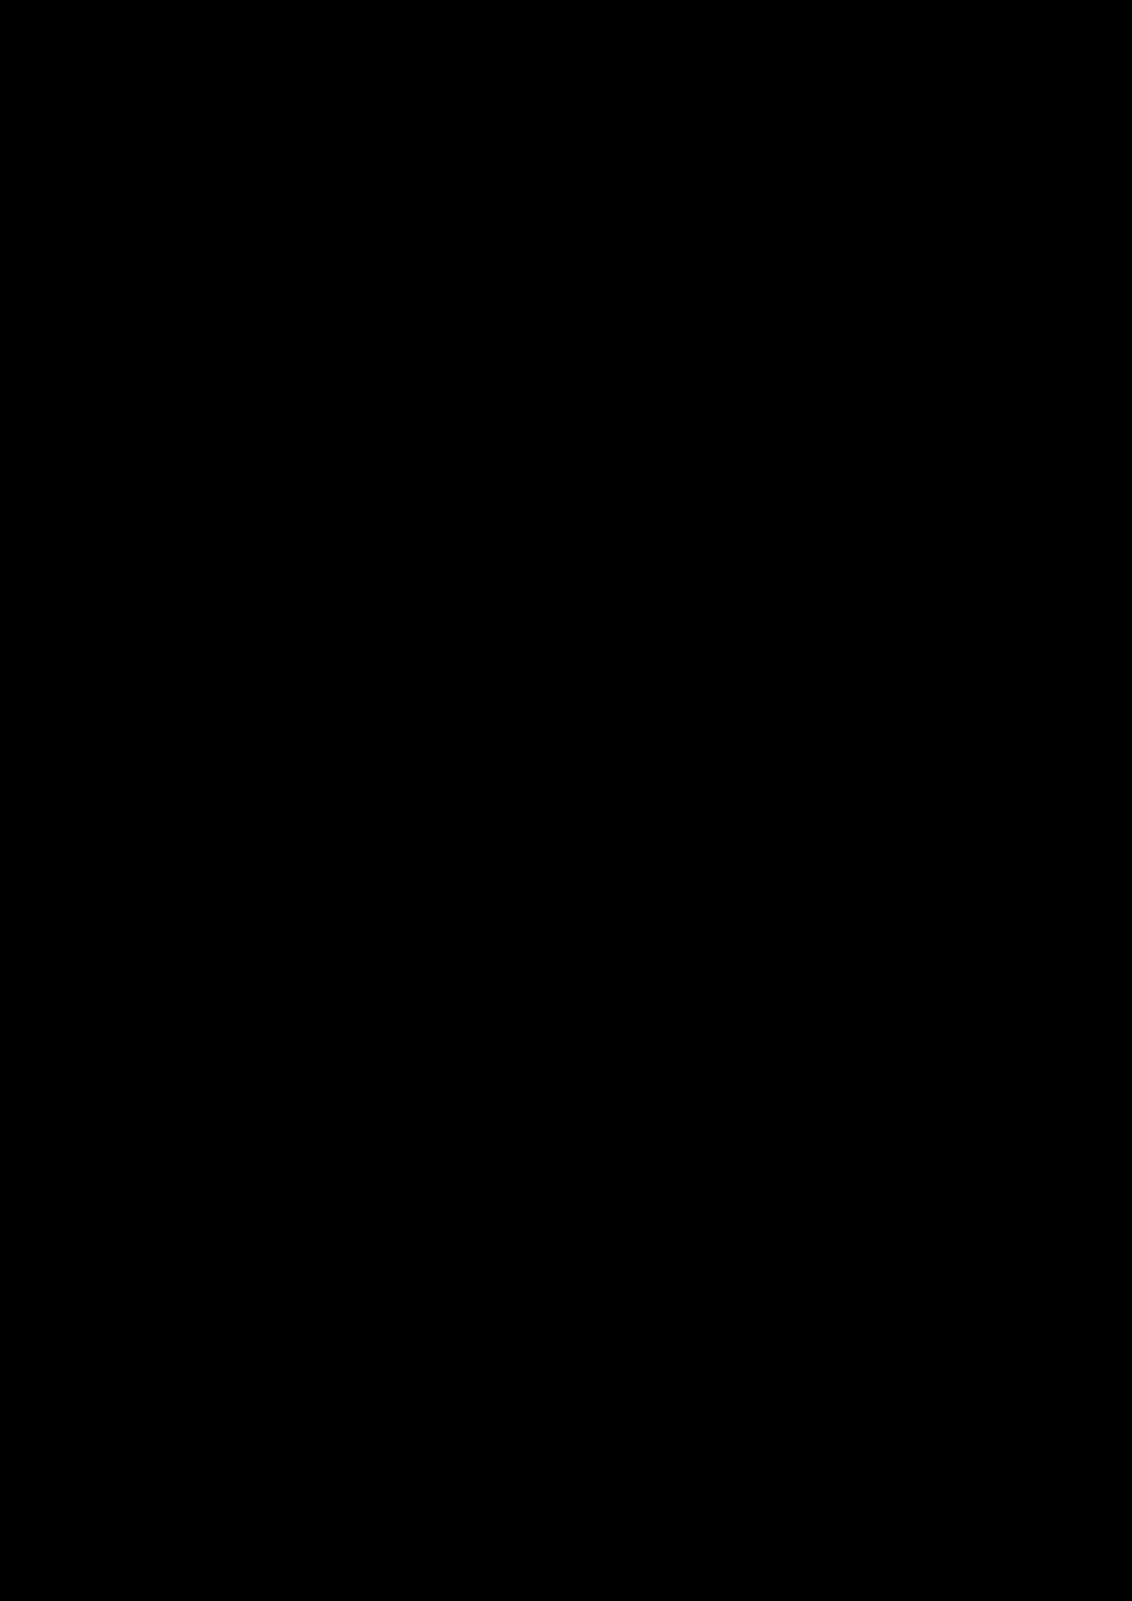 Belyiy sokol slide, Image 62